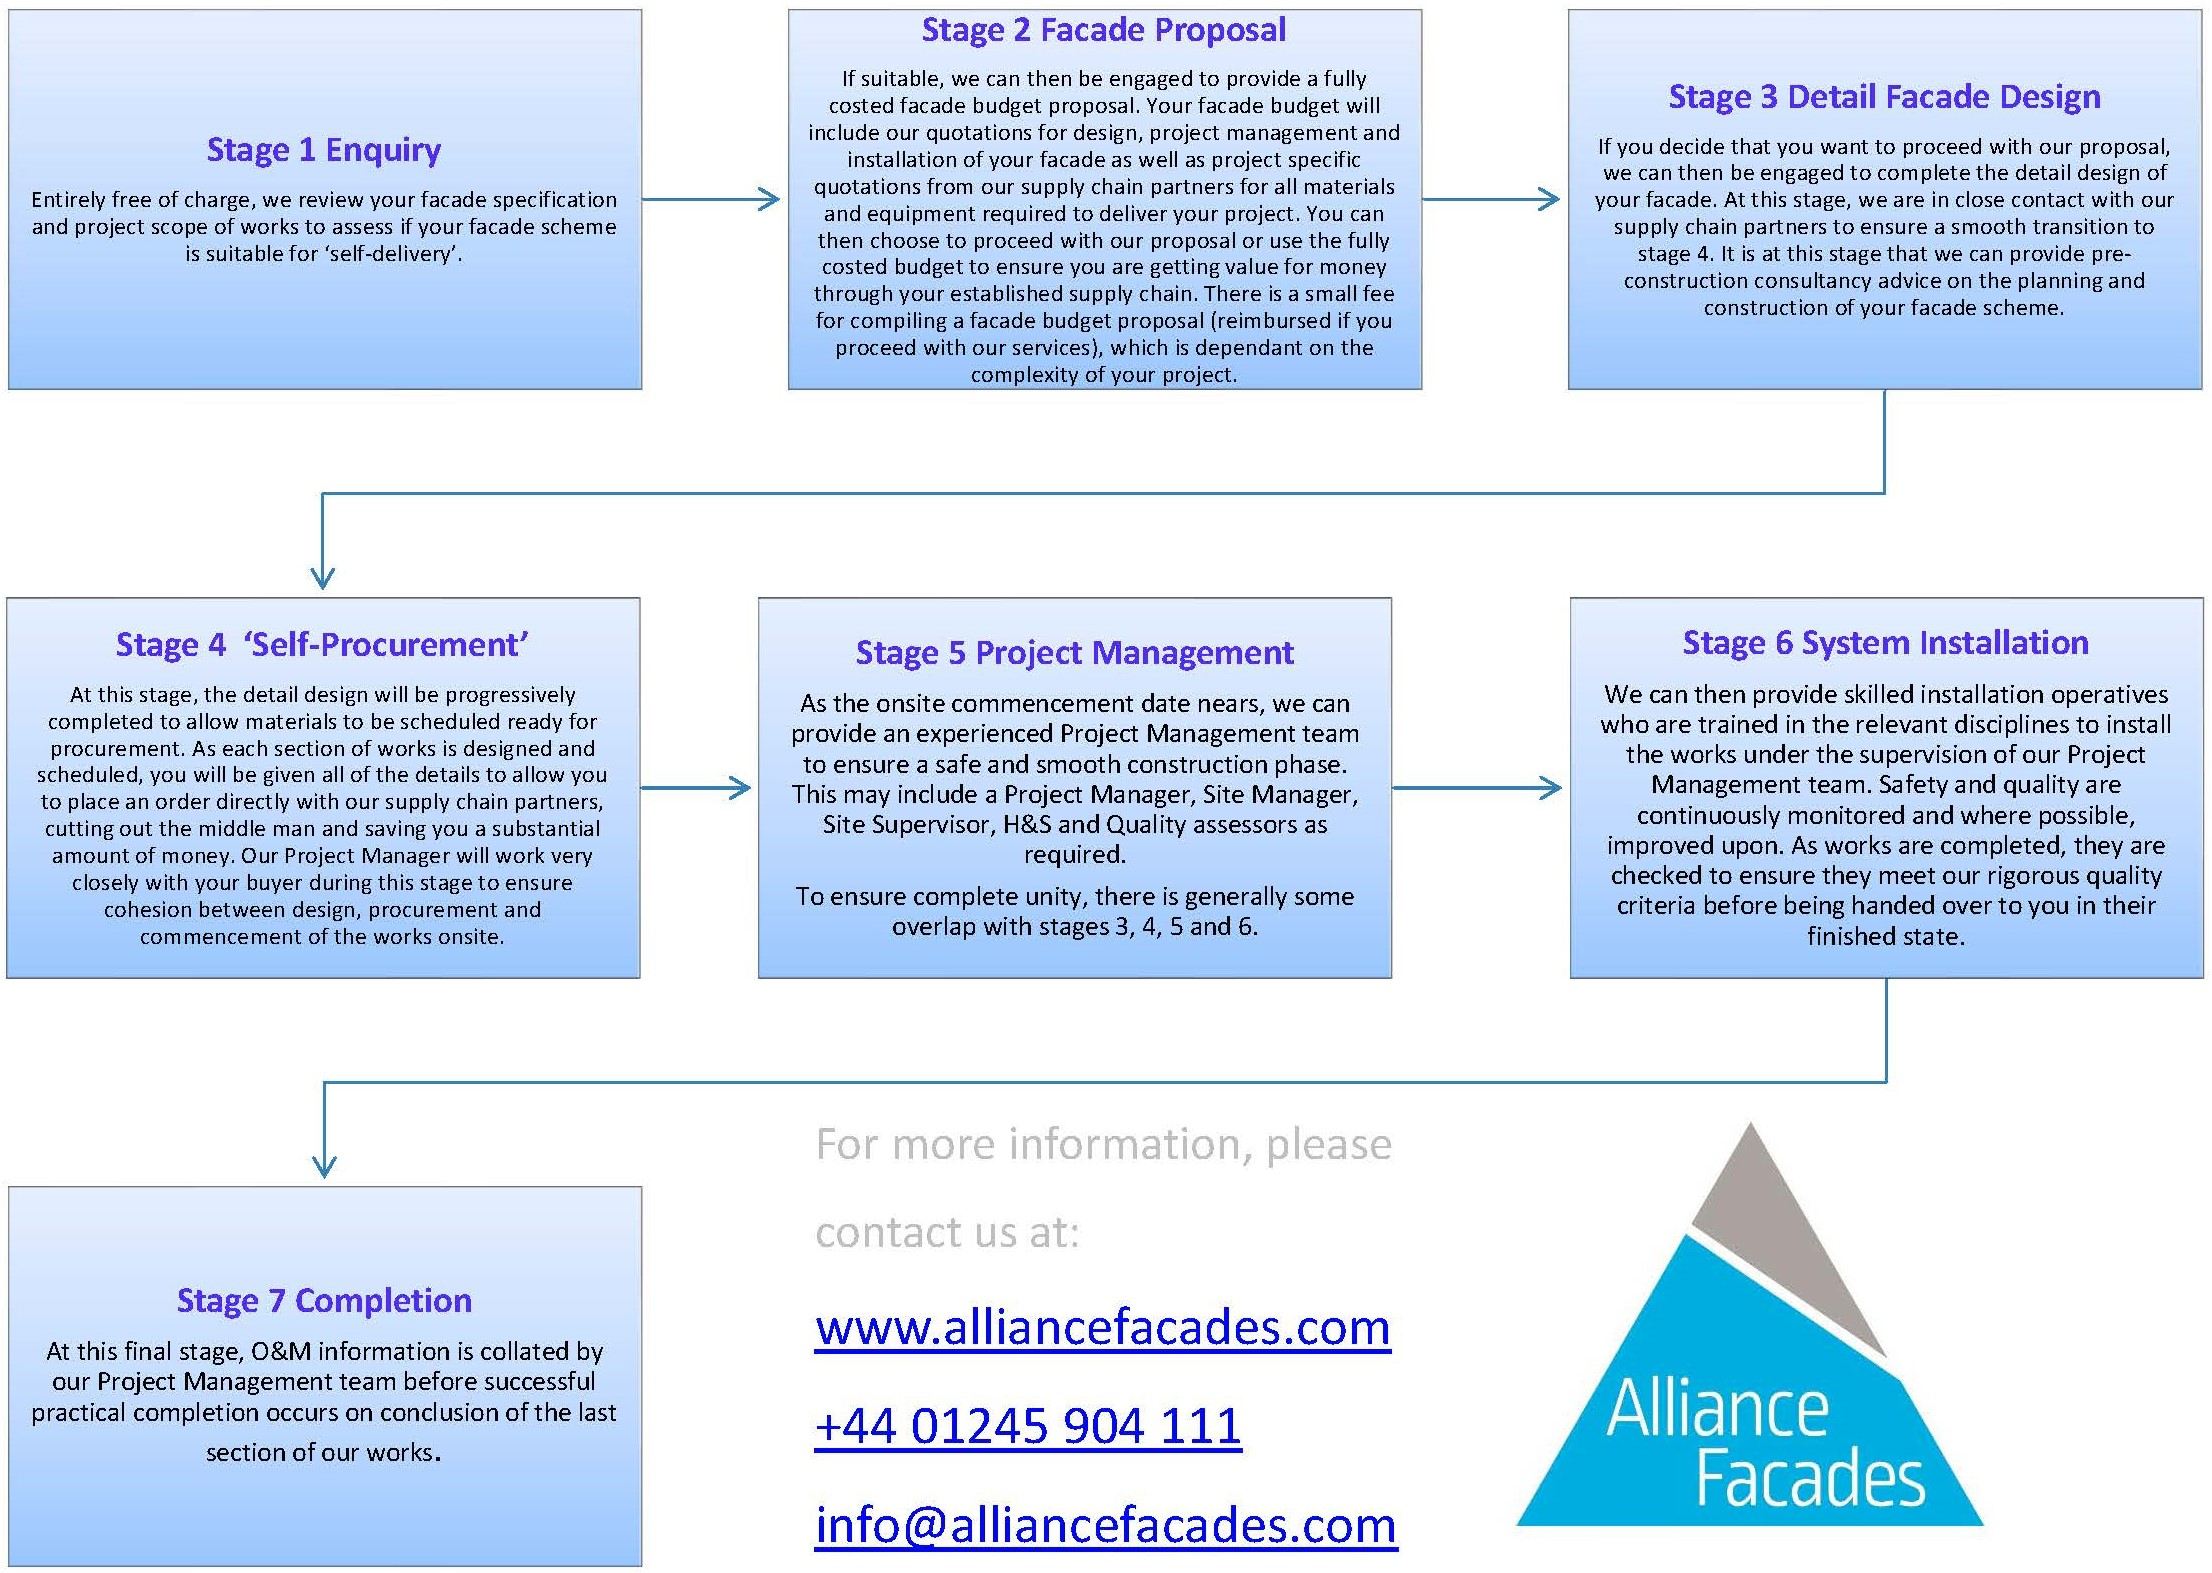 alliancefacades-selfprocurement-stepbystep